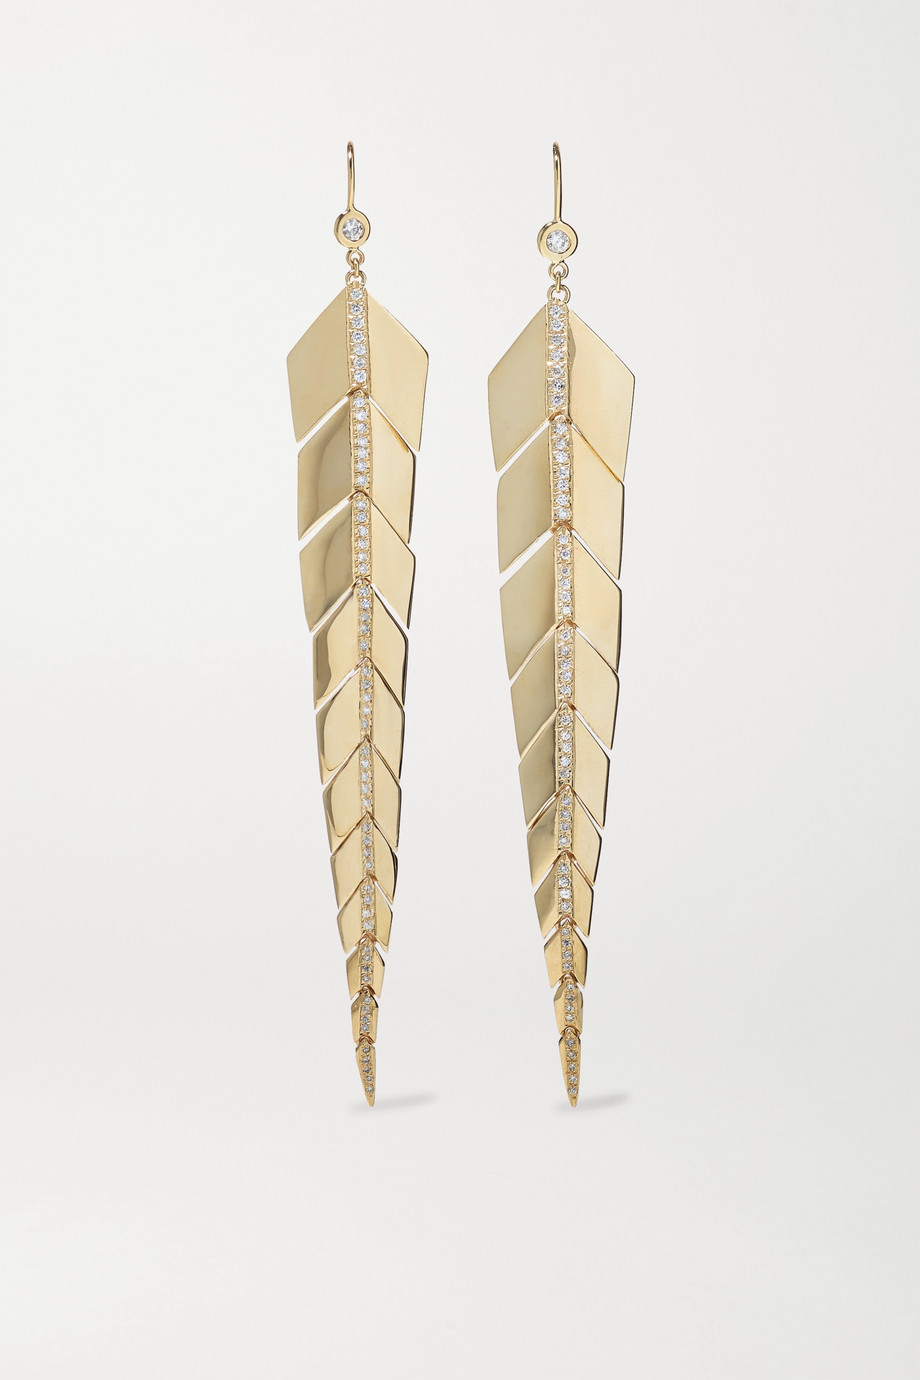 Jacquie Aiche Medium Fishtail Ohrringe aus 14 Karat Gold mit Diamanten